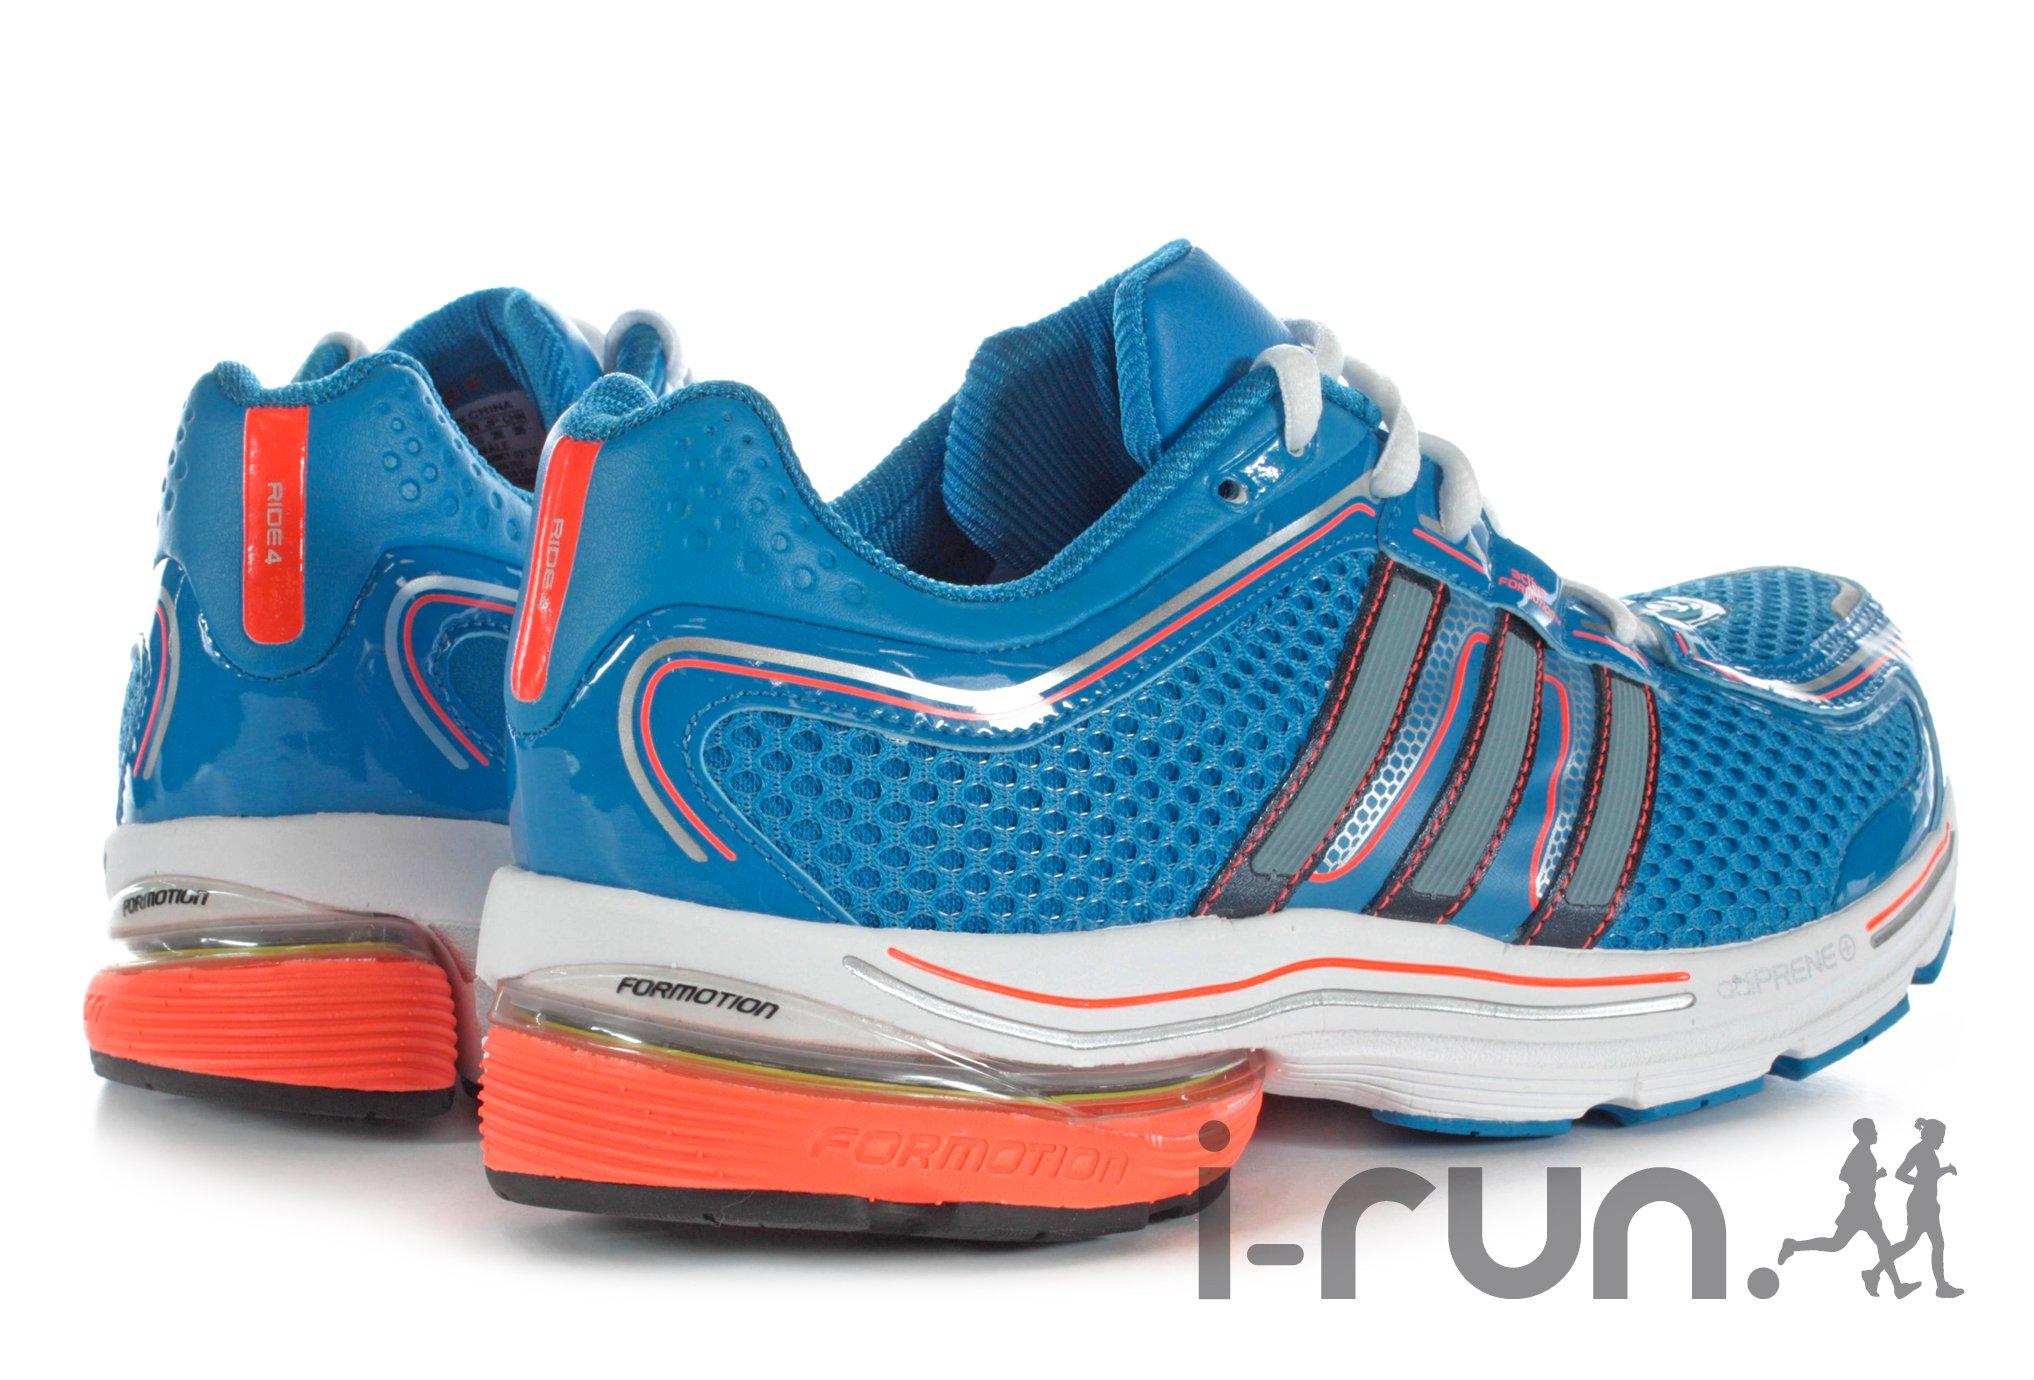 meilleur amorti chaussures running